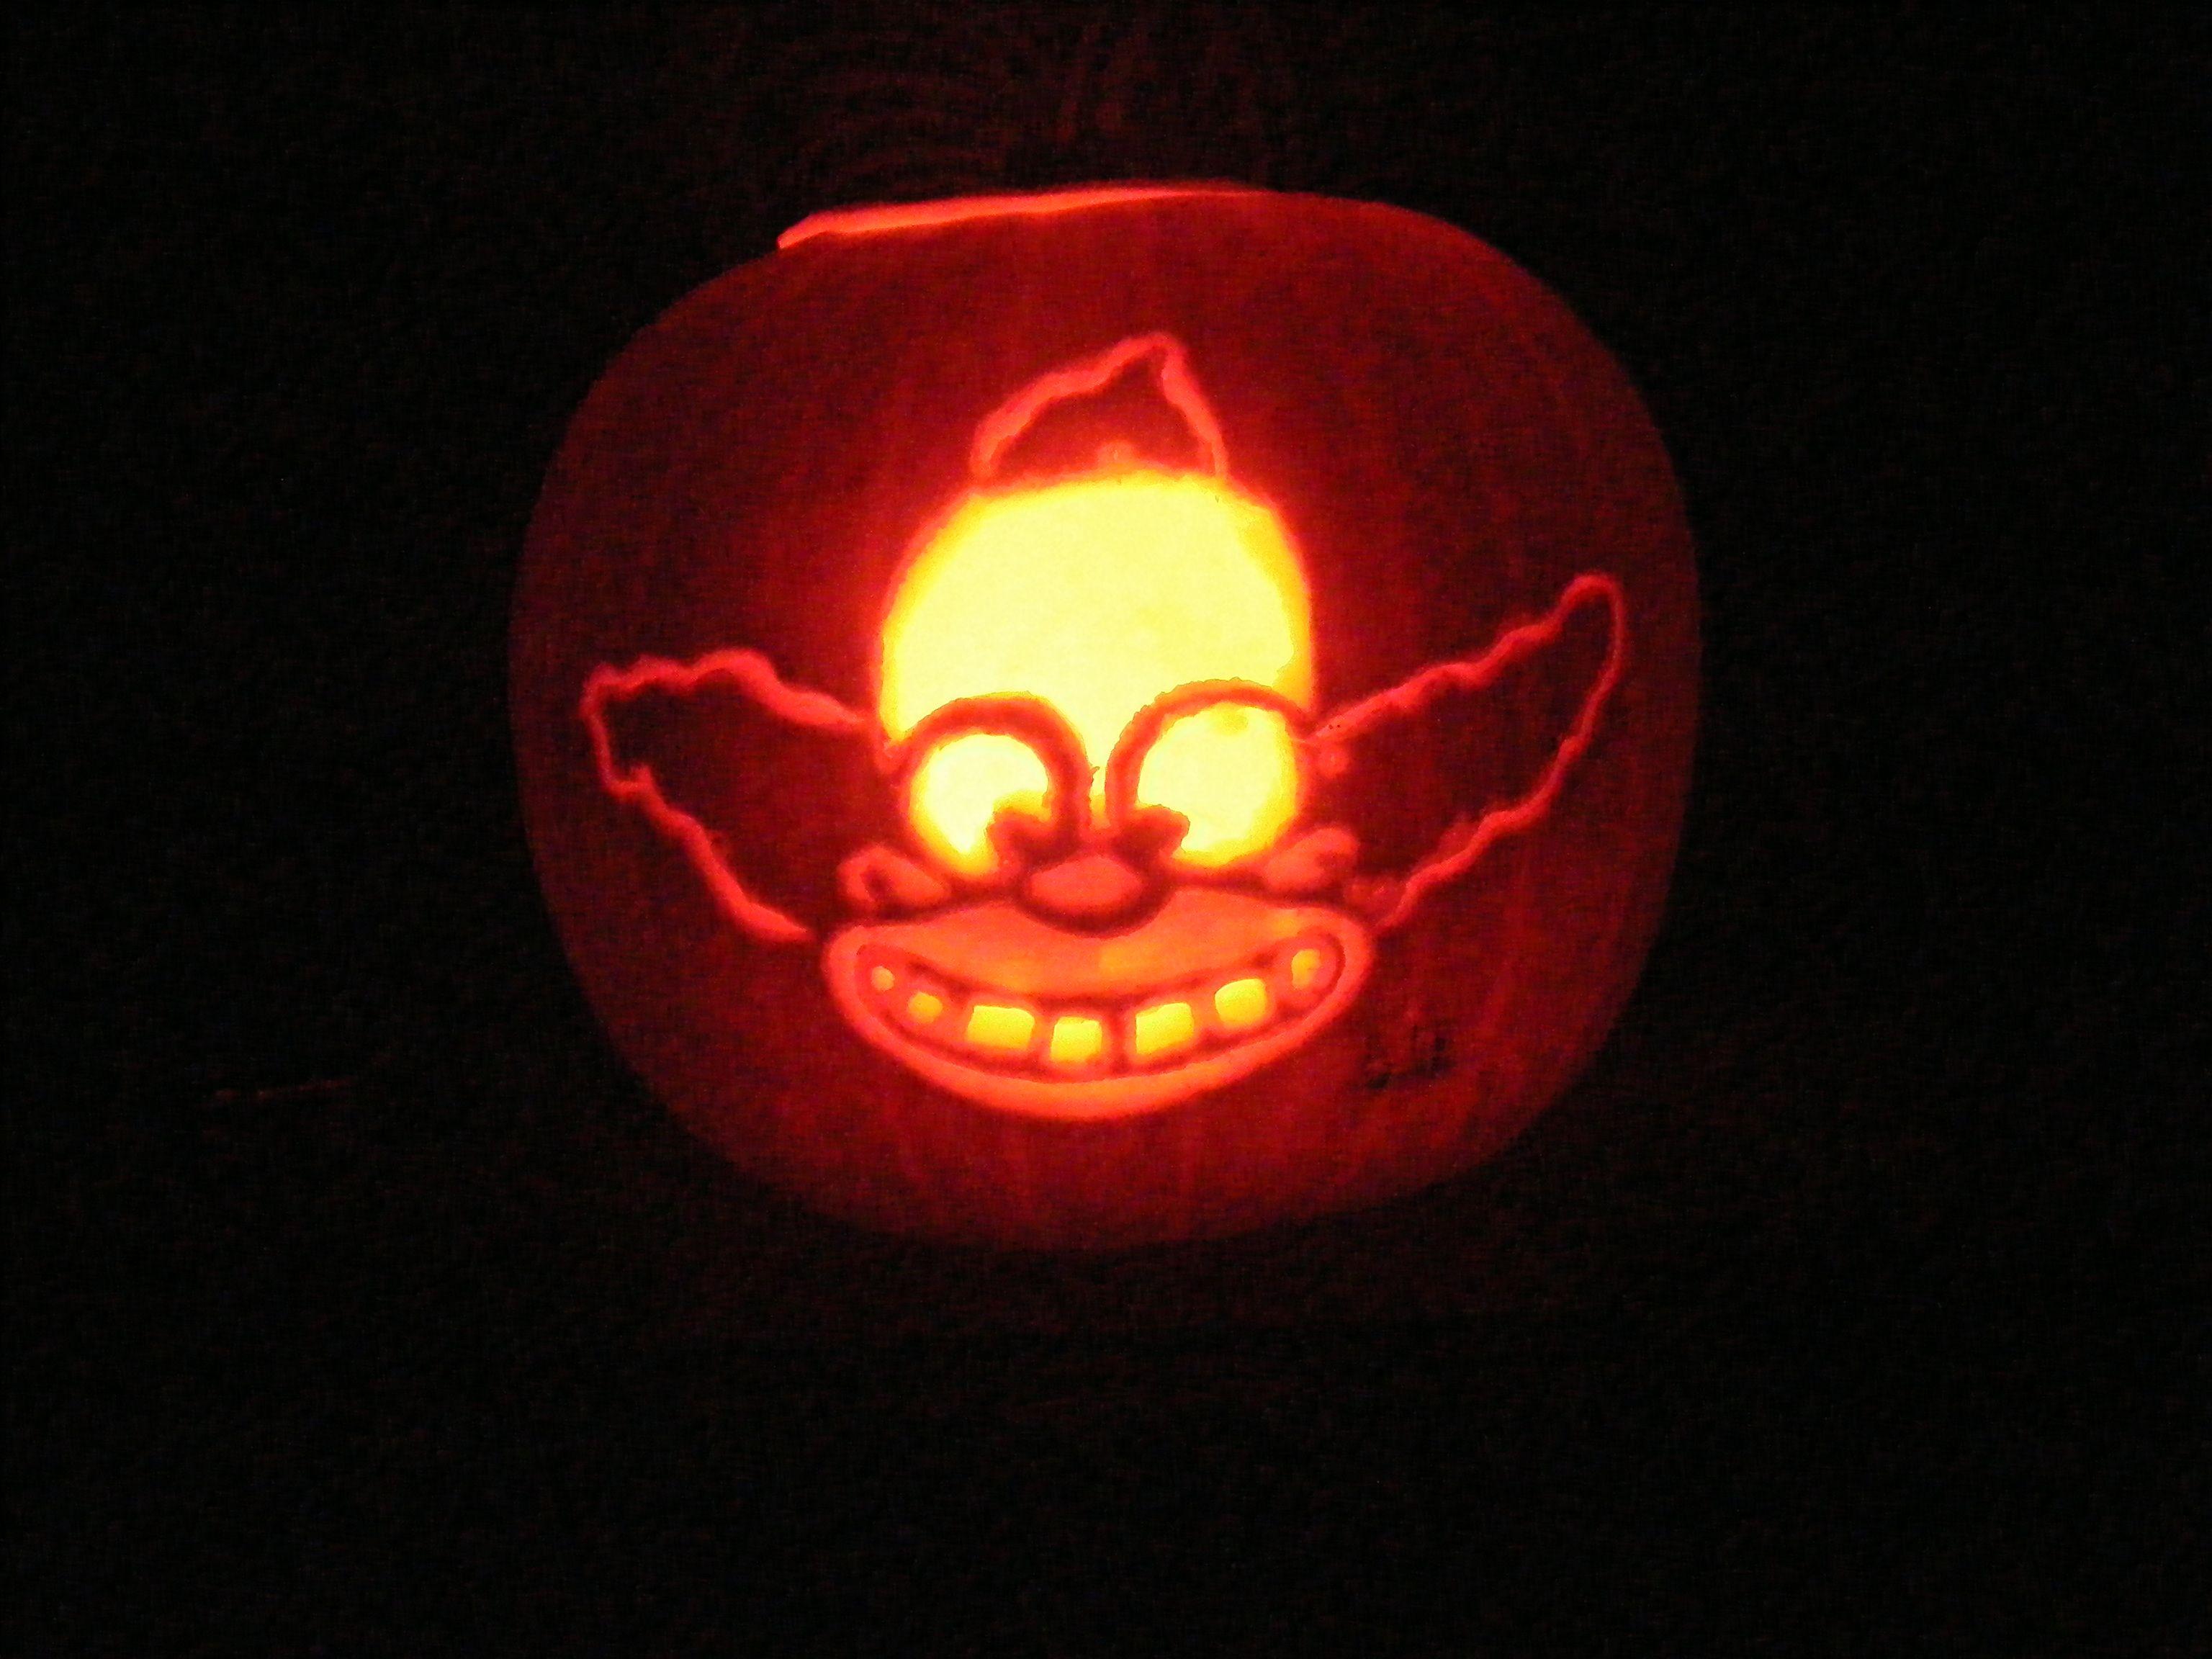 Krusty The Clown Pumpkin Krusty The Clown Pumpkin Carving Pumpkin